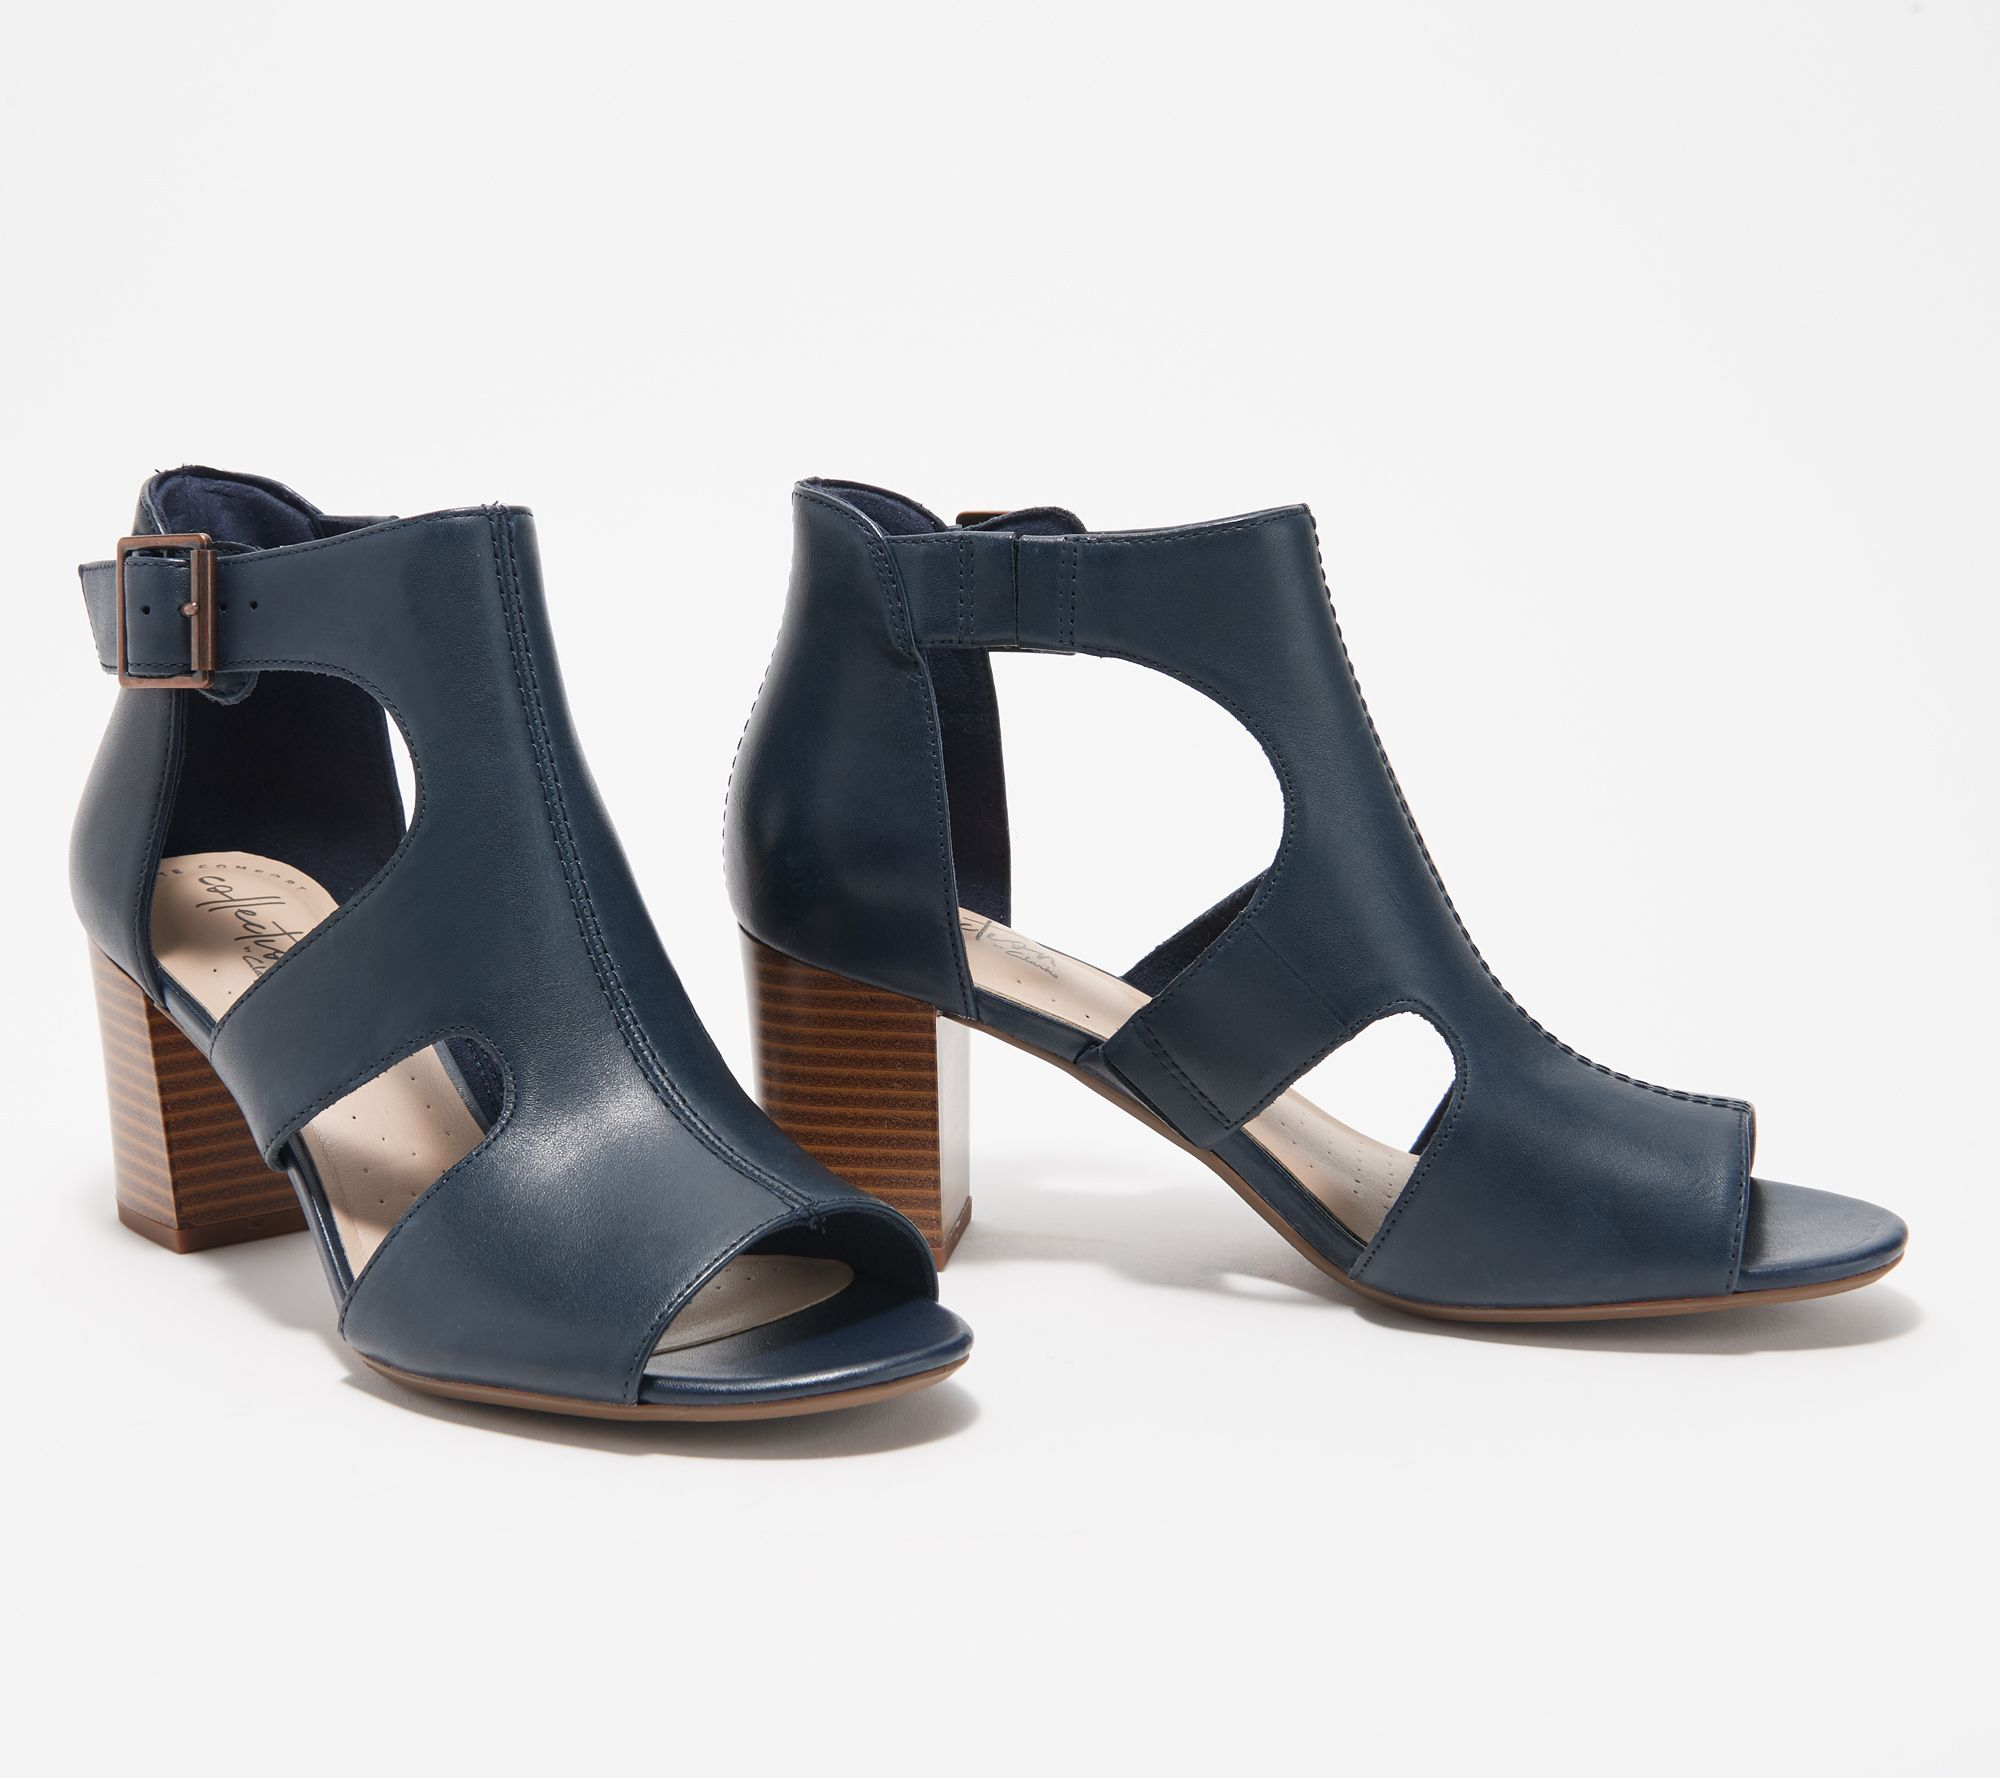 4094cc247096 Clarks Collection Leather Heeled Sandals - Deva Heidi - Page 1 — QVC.com